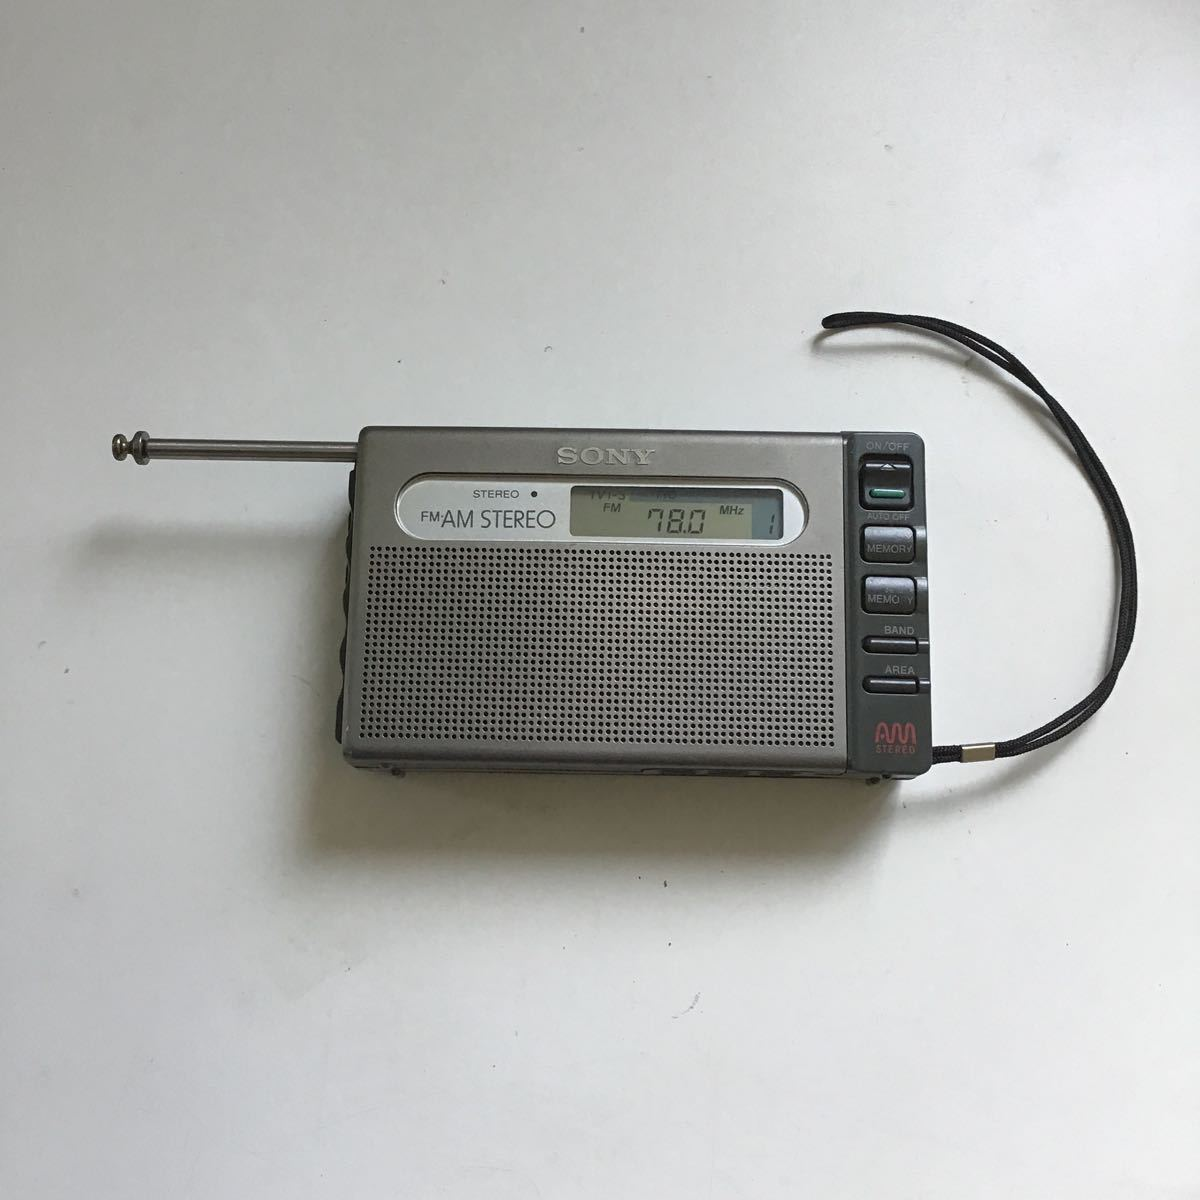 SONY SRF-M100 ソニーラジオ FM/AM STEREO ジャンク品 (715)